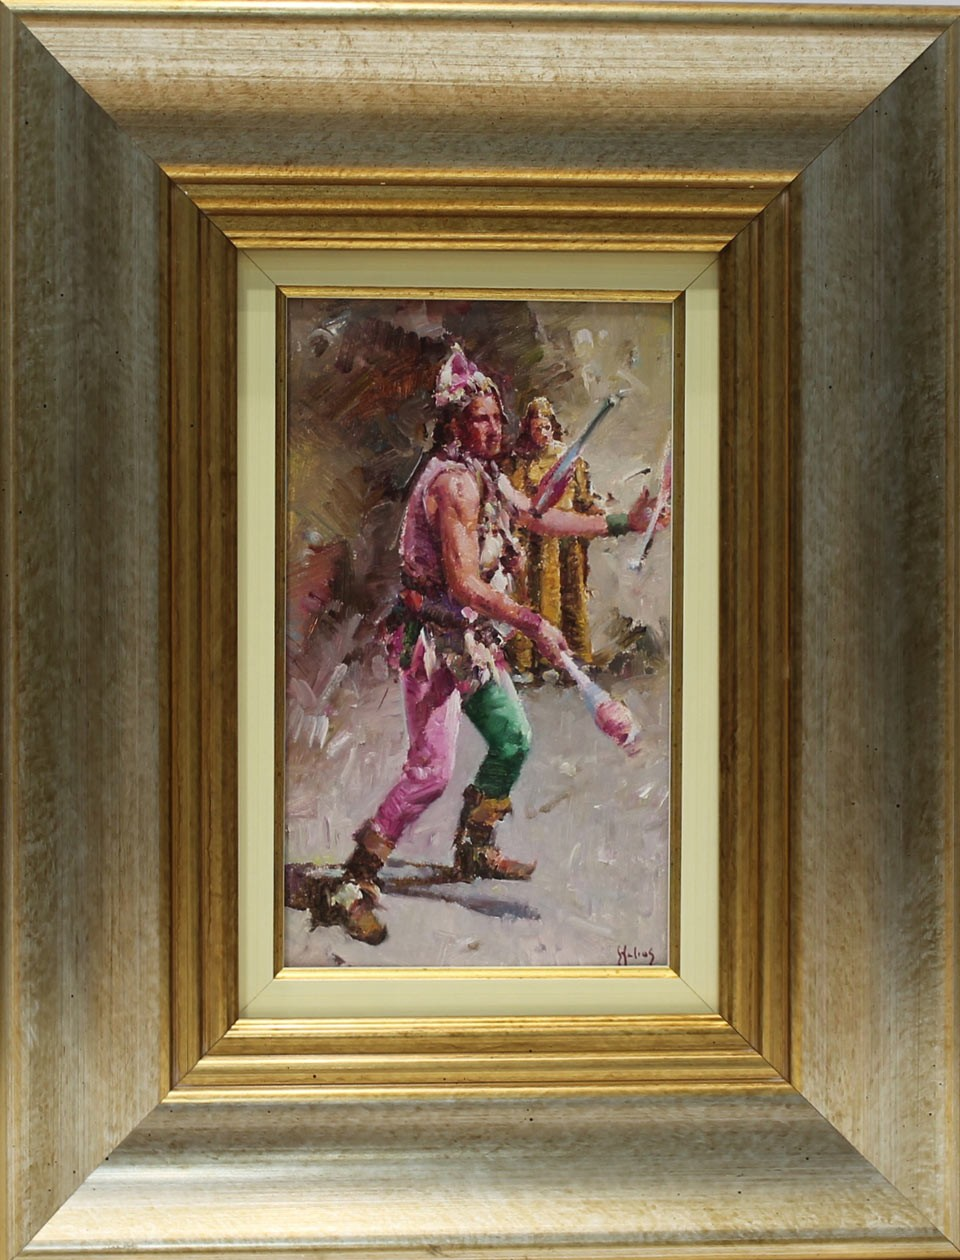 Helios Gisbert: Figura de arlequín